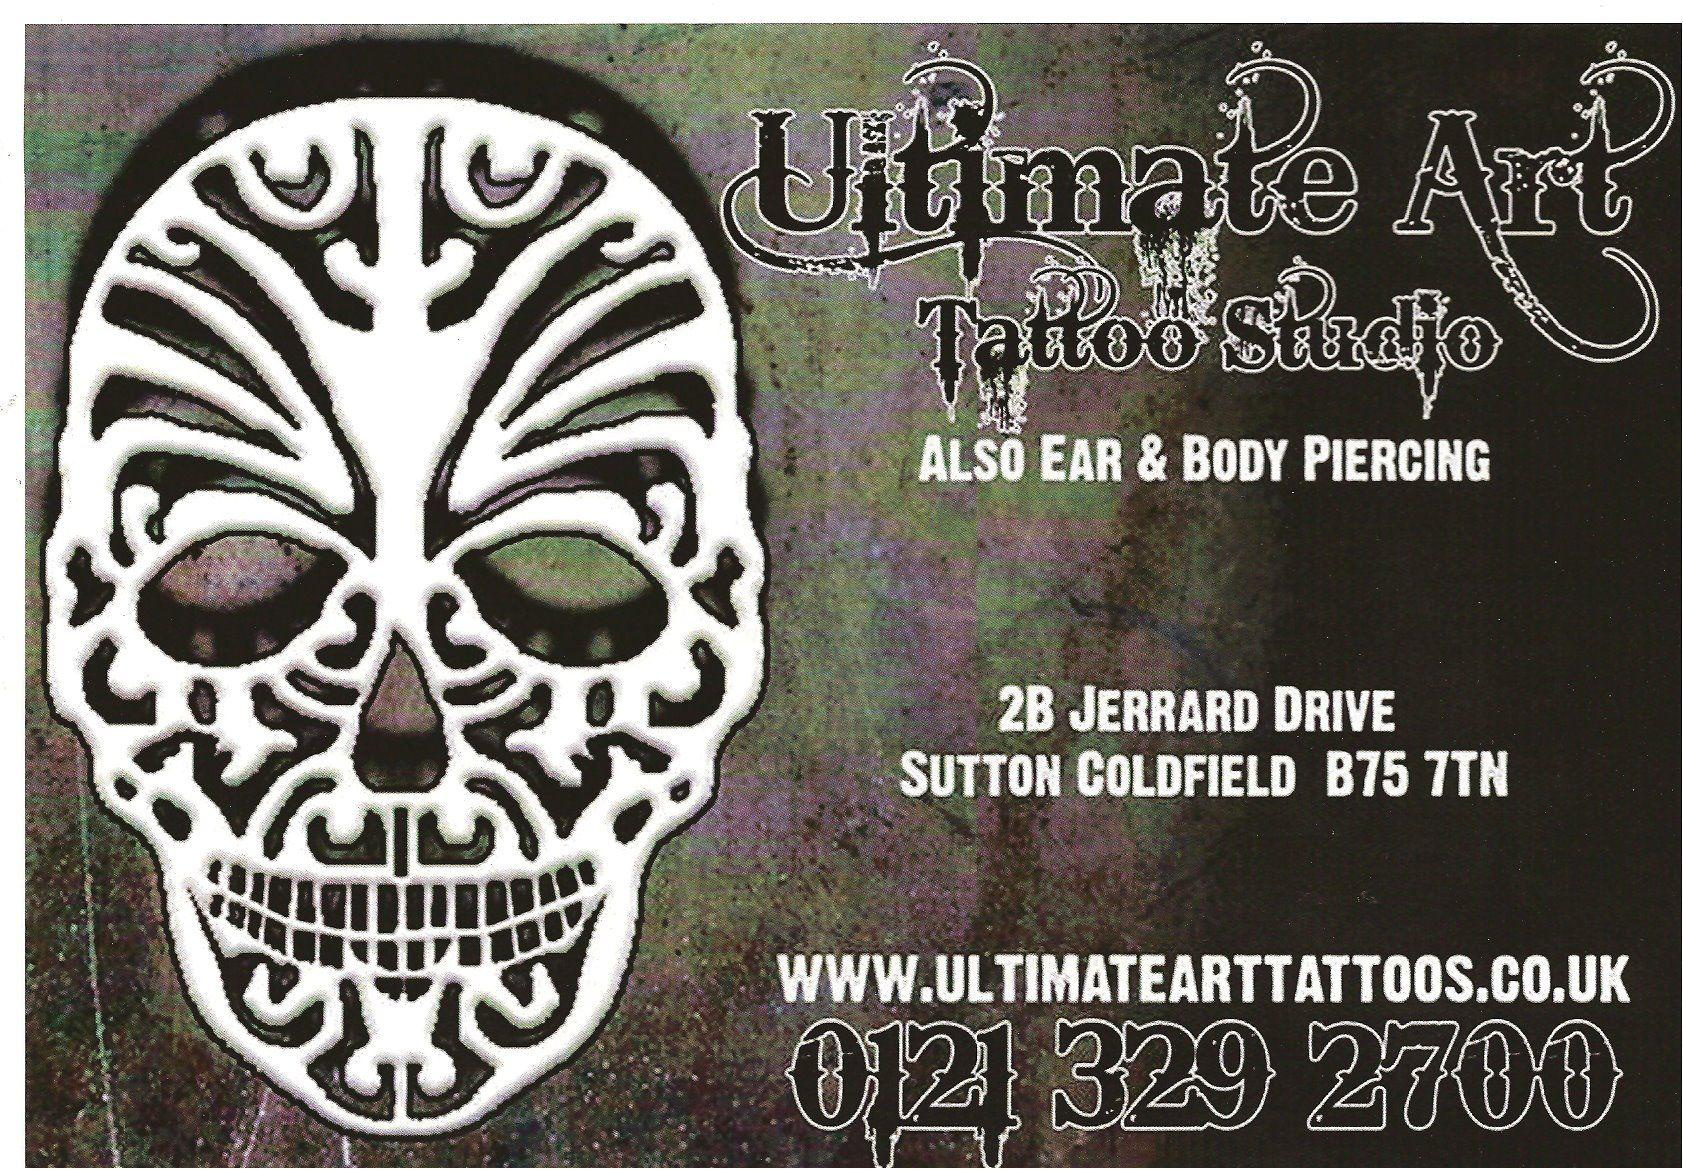 Ultimate Art Studio tattoo studio sutton coldfield ultimate art tattoo | my work